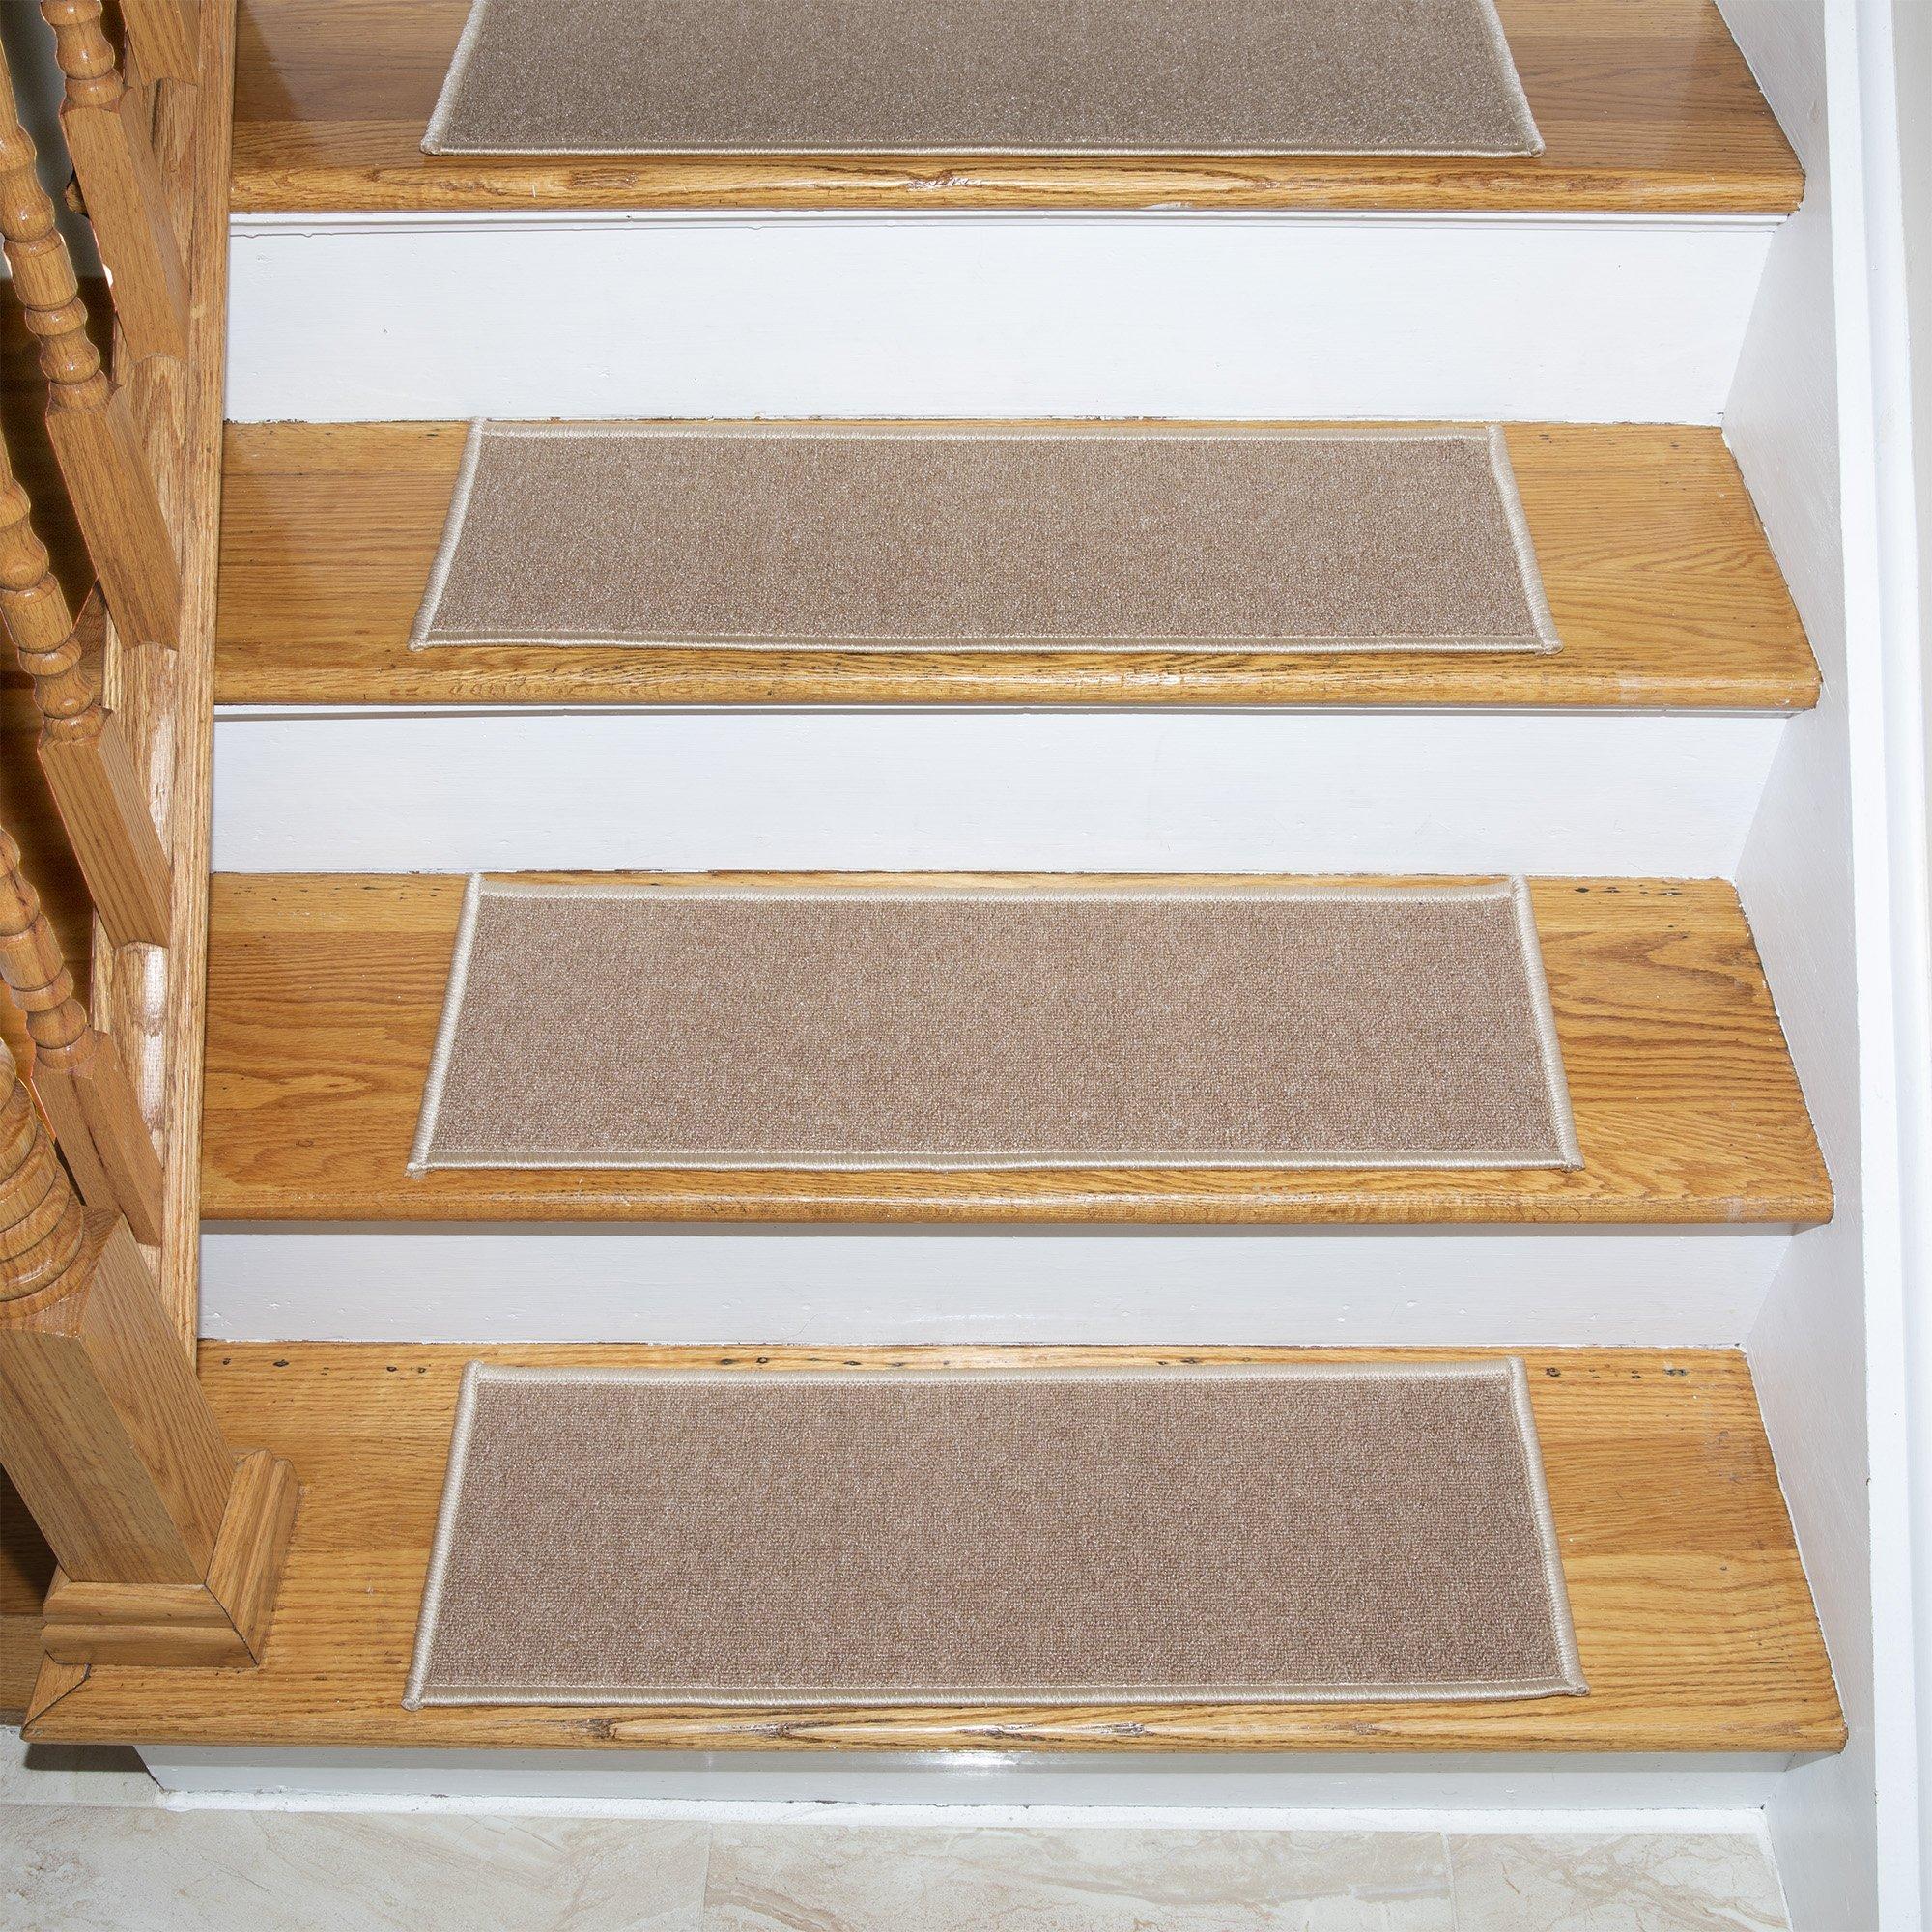 Ottomanson Set Variation of Skid-Resistant Rubber Backing Non-Slip Carpet Stair Treads (8.5'' x 26.5''-14Pack), 14 Pack, Dark Beige